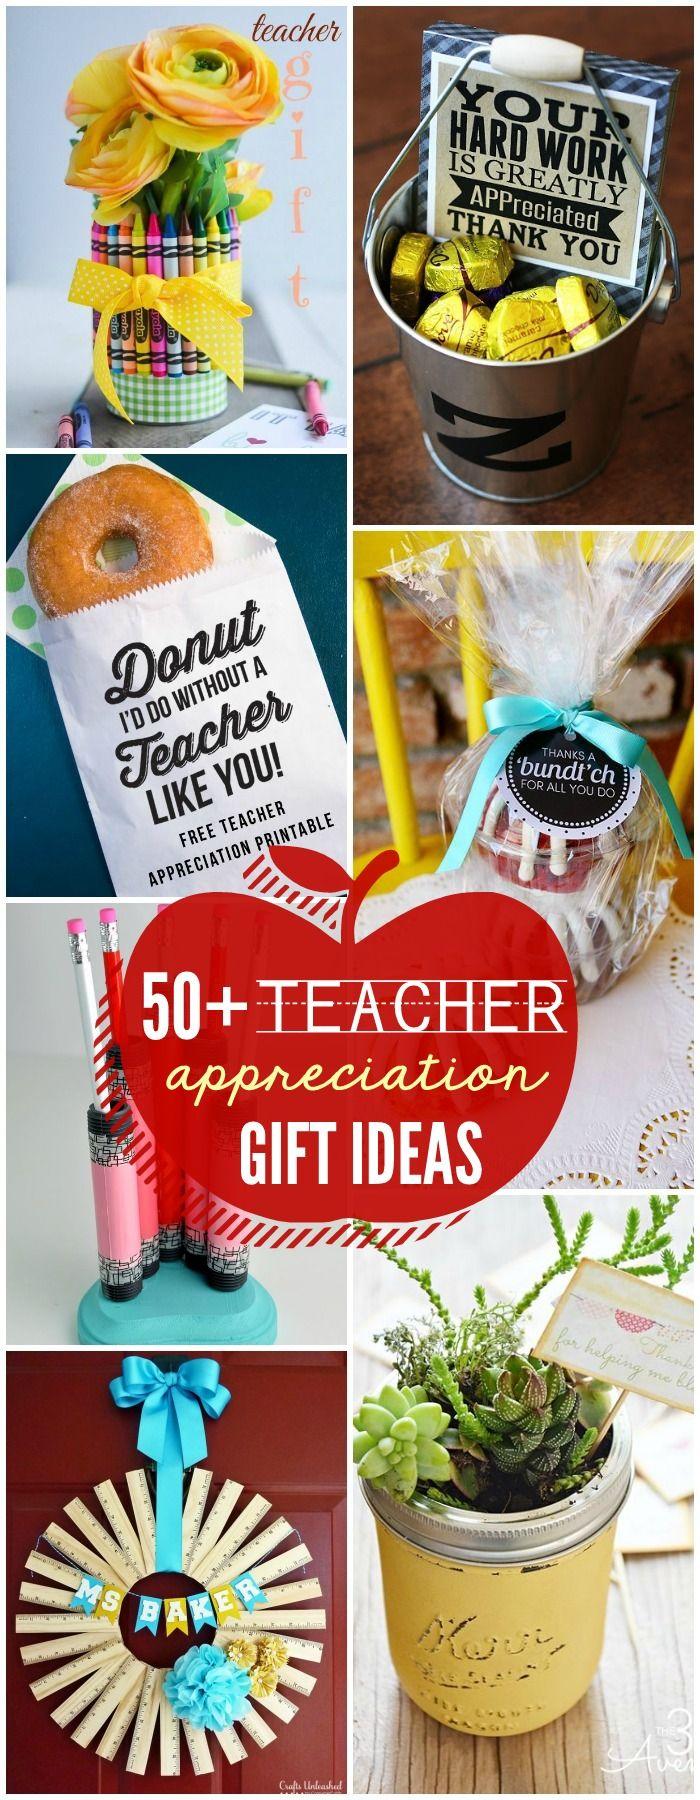 50+ Must-See Teacher Appreciate Gift Ideas on { lilluna.com } Lots of cute and e...